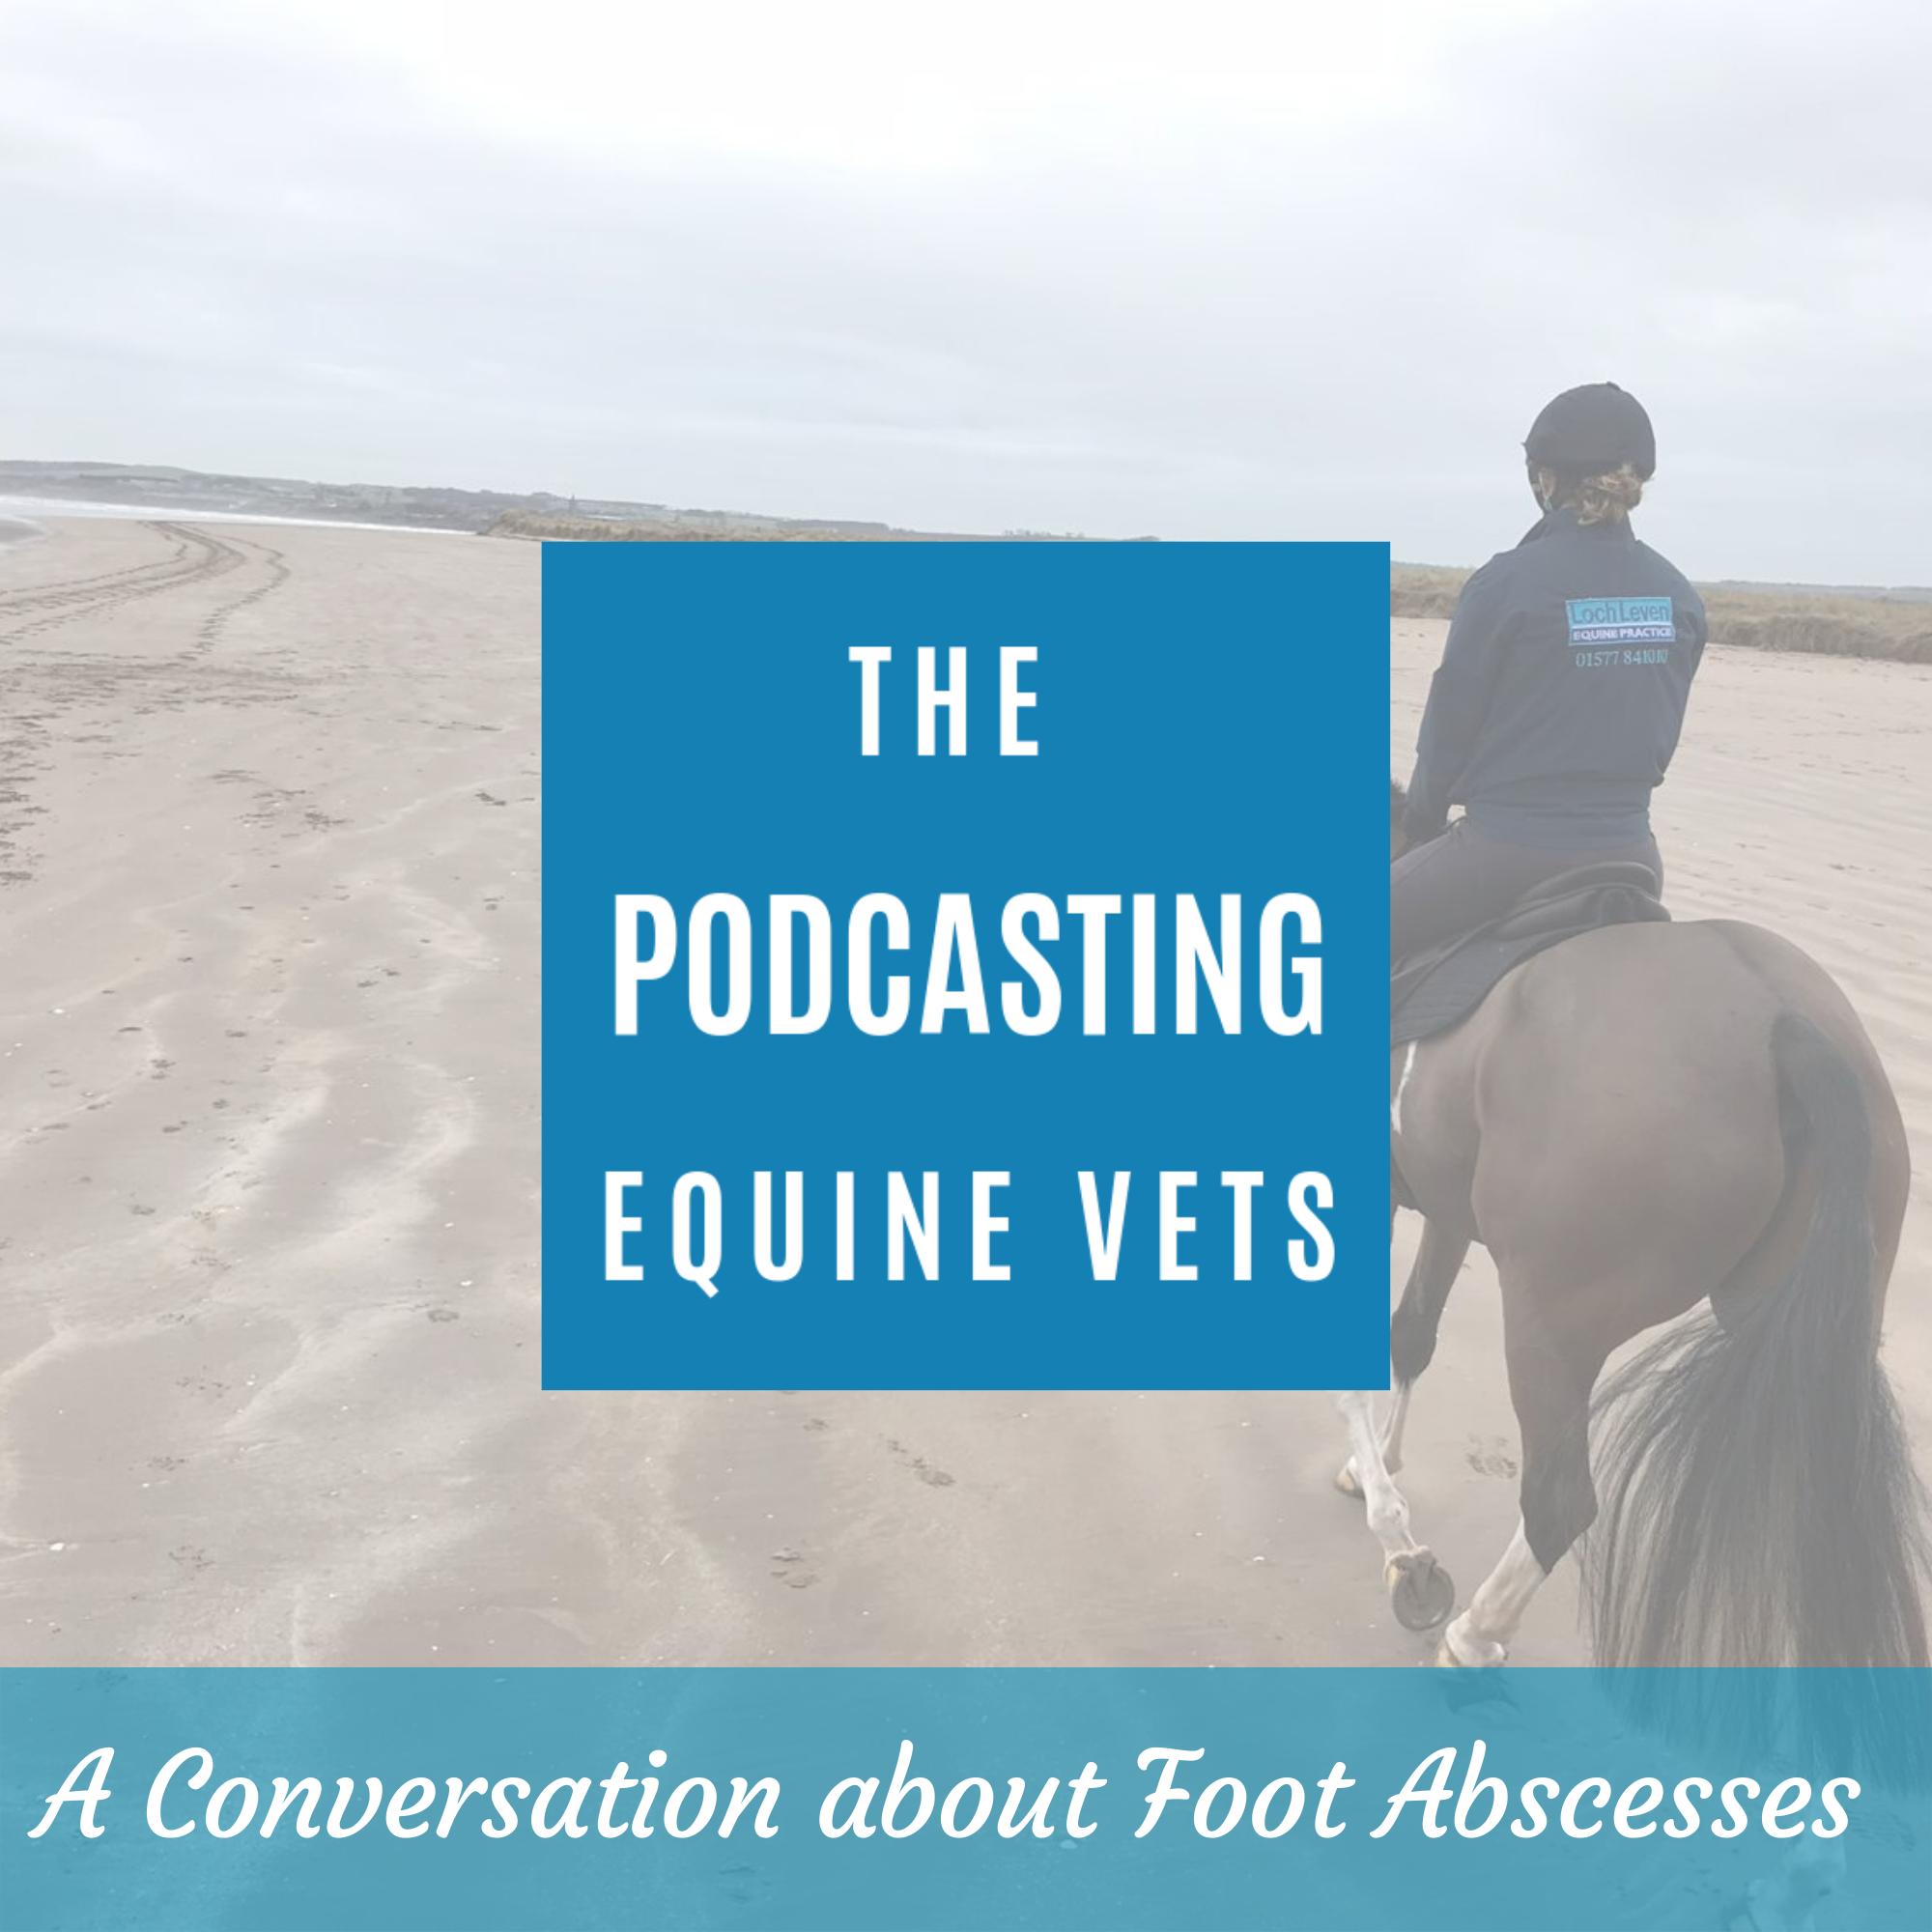 A Conversation About Foot Abscesses